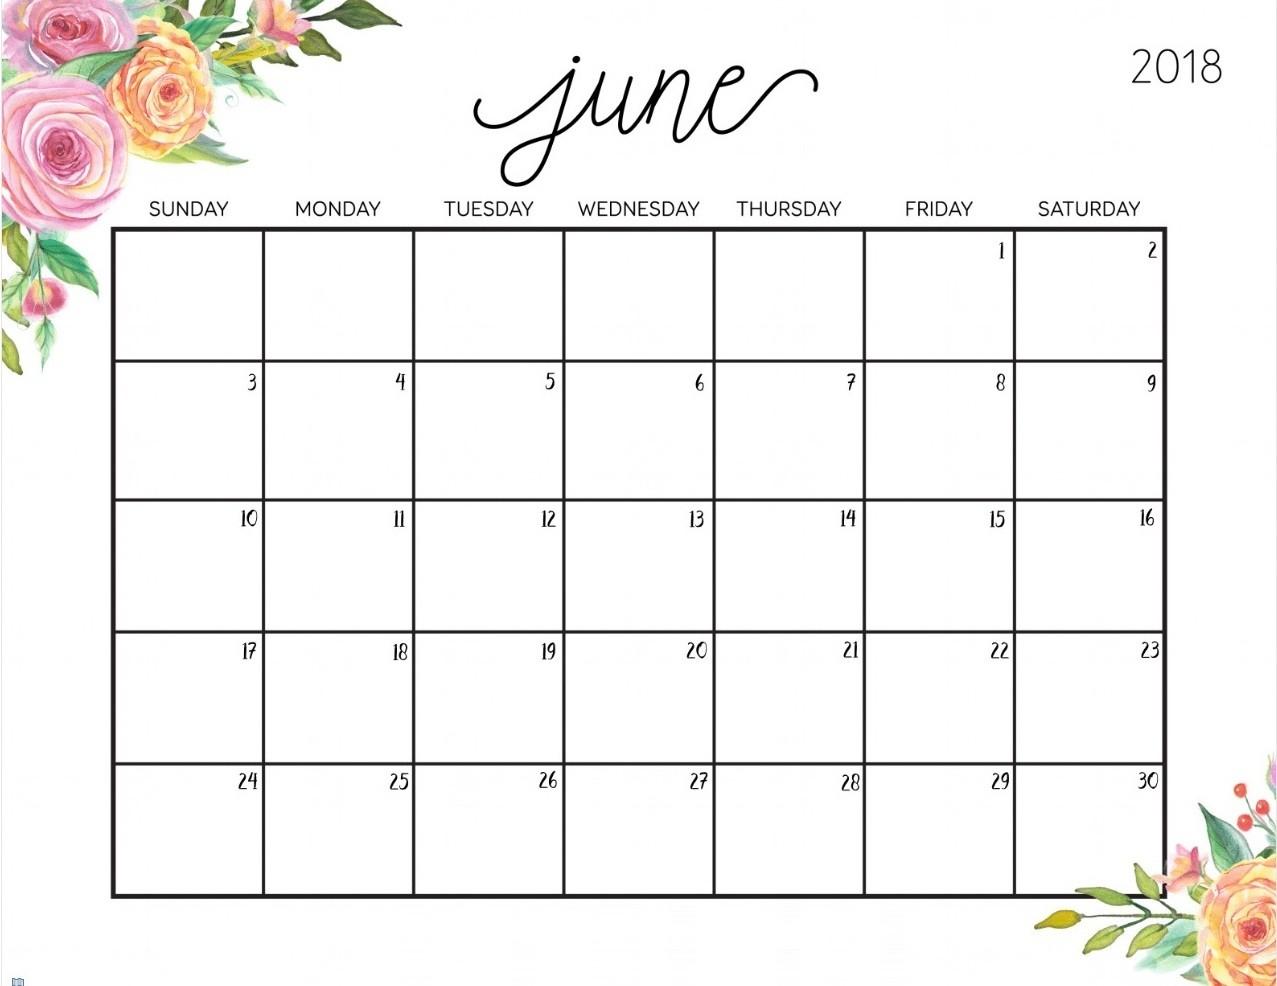 content calendar template google sheets  Free Printable Calendar June 2018 | Printable 2019 ..